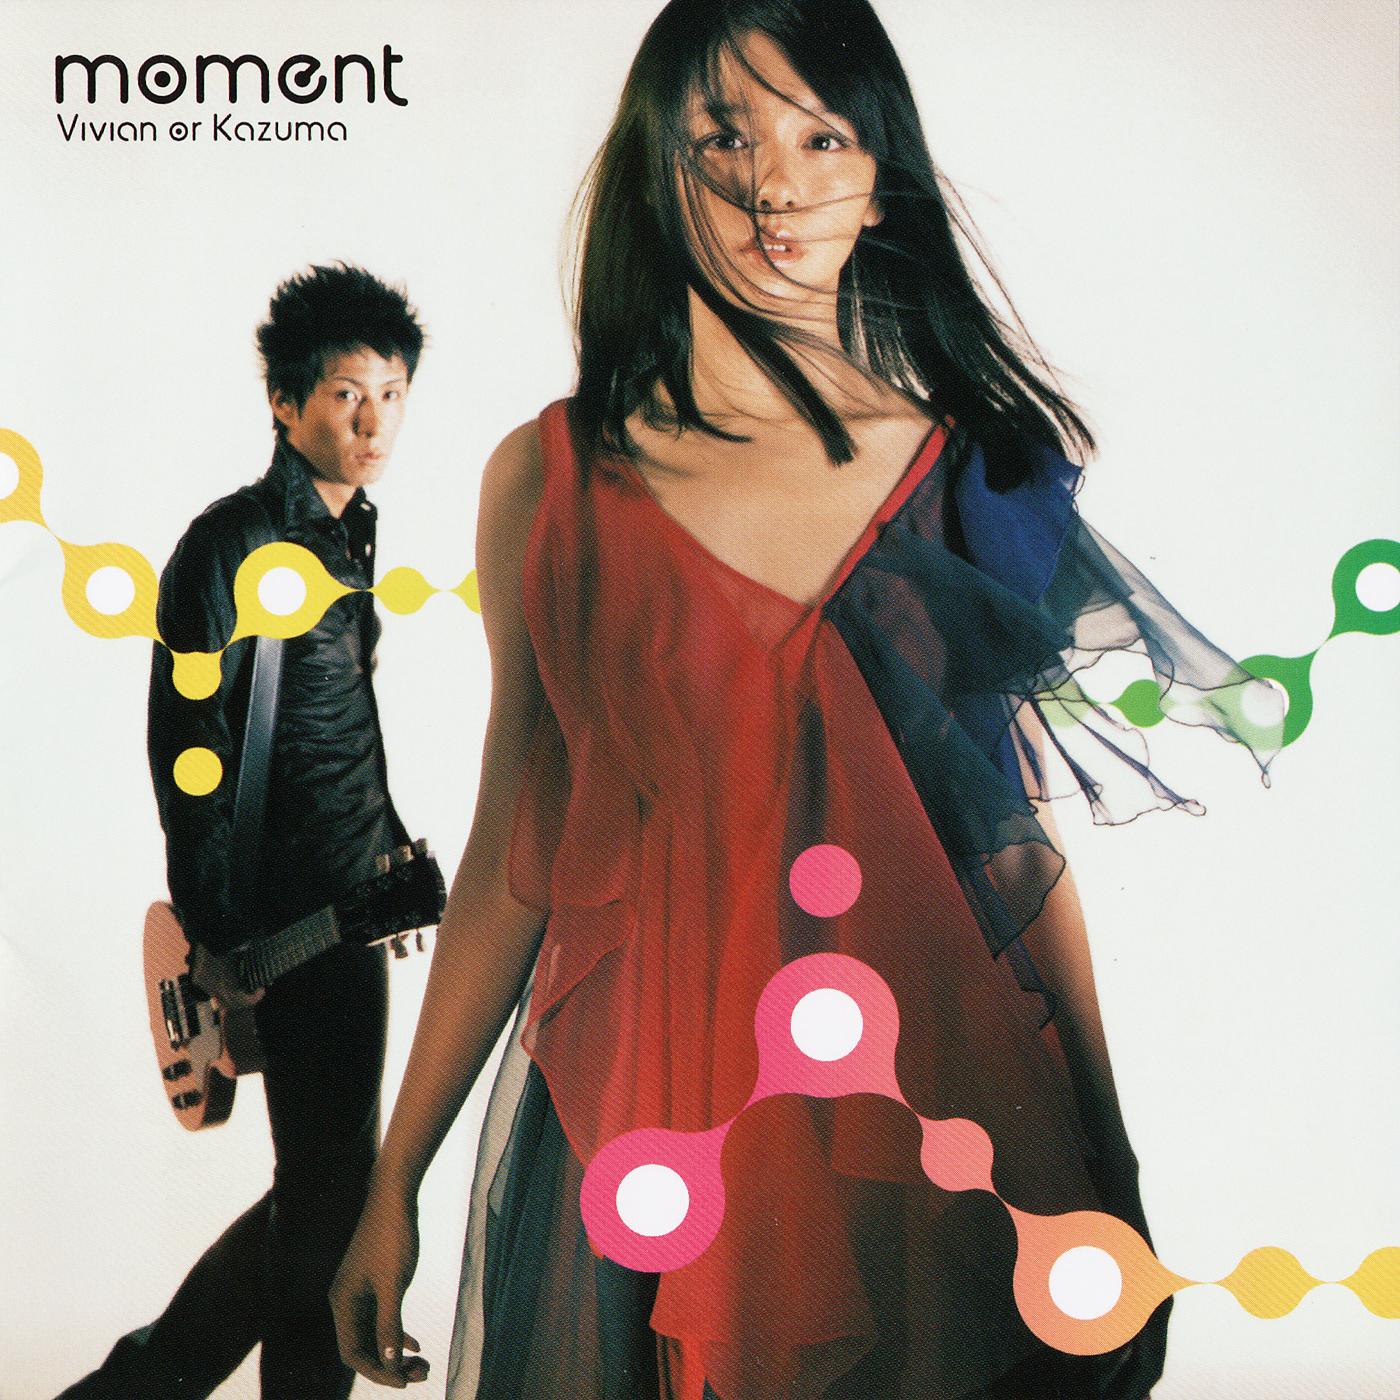 20170319.2215.2 Vivian or Kazuma - moment (FLAC) cover.jpg